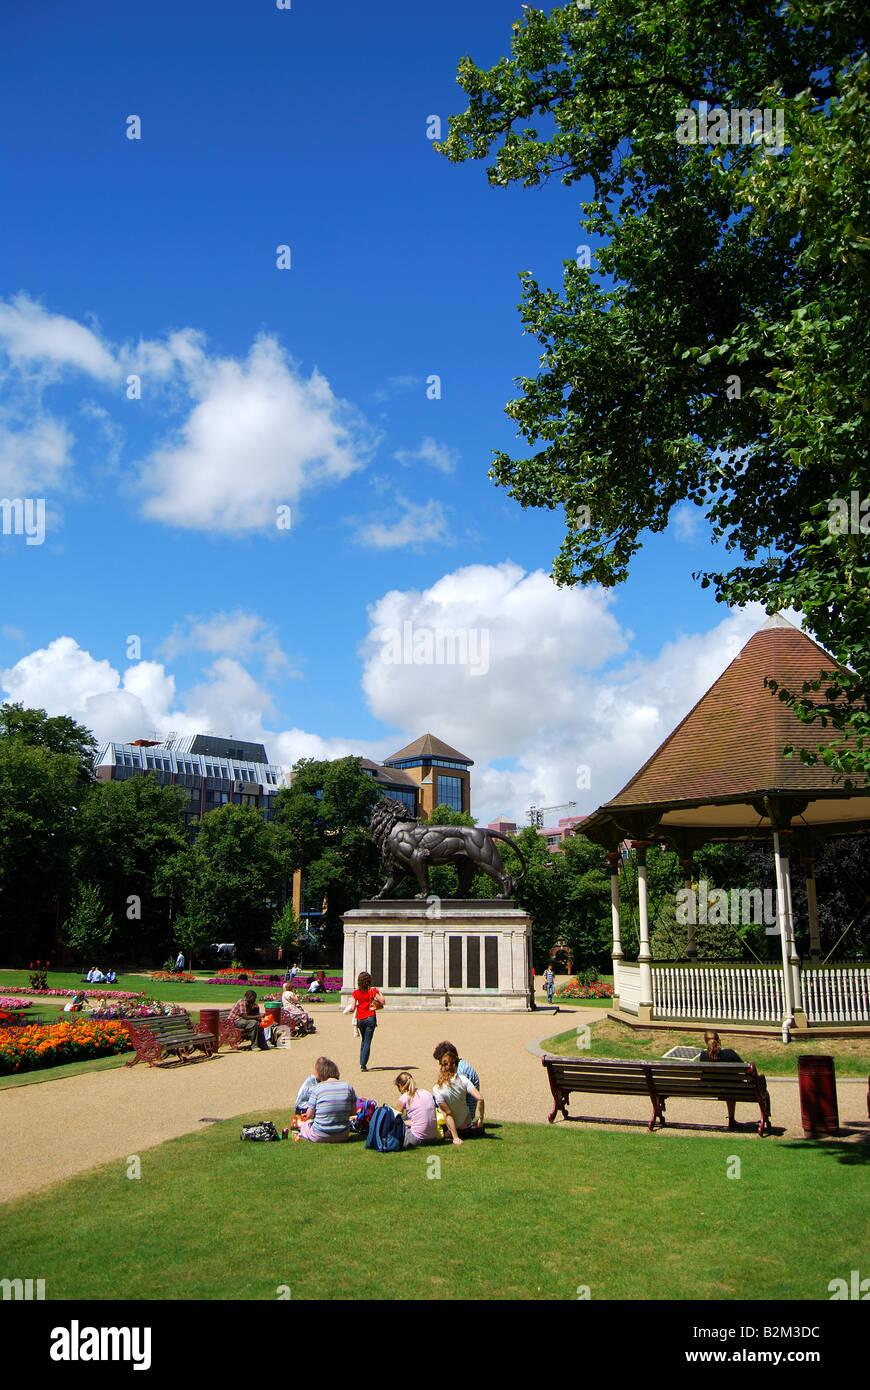 Gardens showing bandstand, Forbury Gardens, Reading, Berkshire, England, United Kingdom Stock Photo